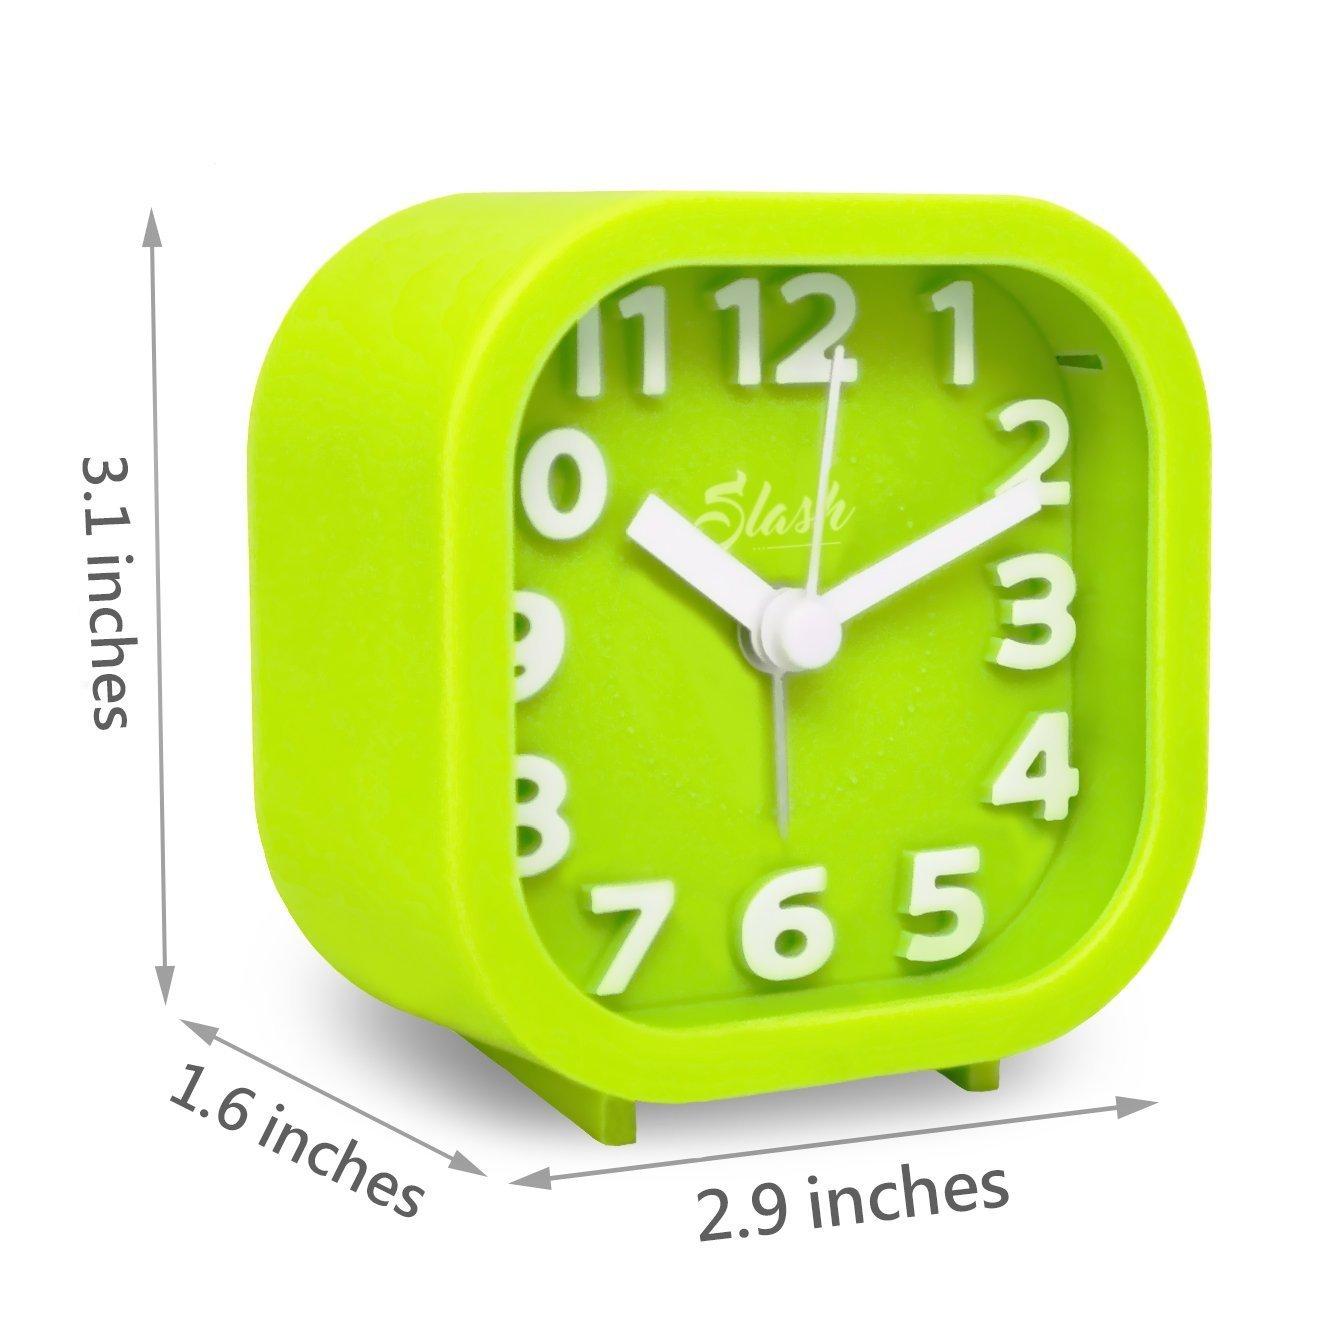 Slash 3D Digital Creative Desk Alarm Clock, Simple Candy Color for Sitting Room, Bedroom, Office, Snooze Function, Non Ticking, Nightlight Function ...